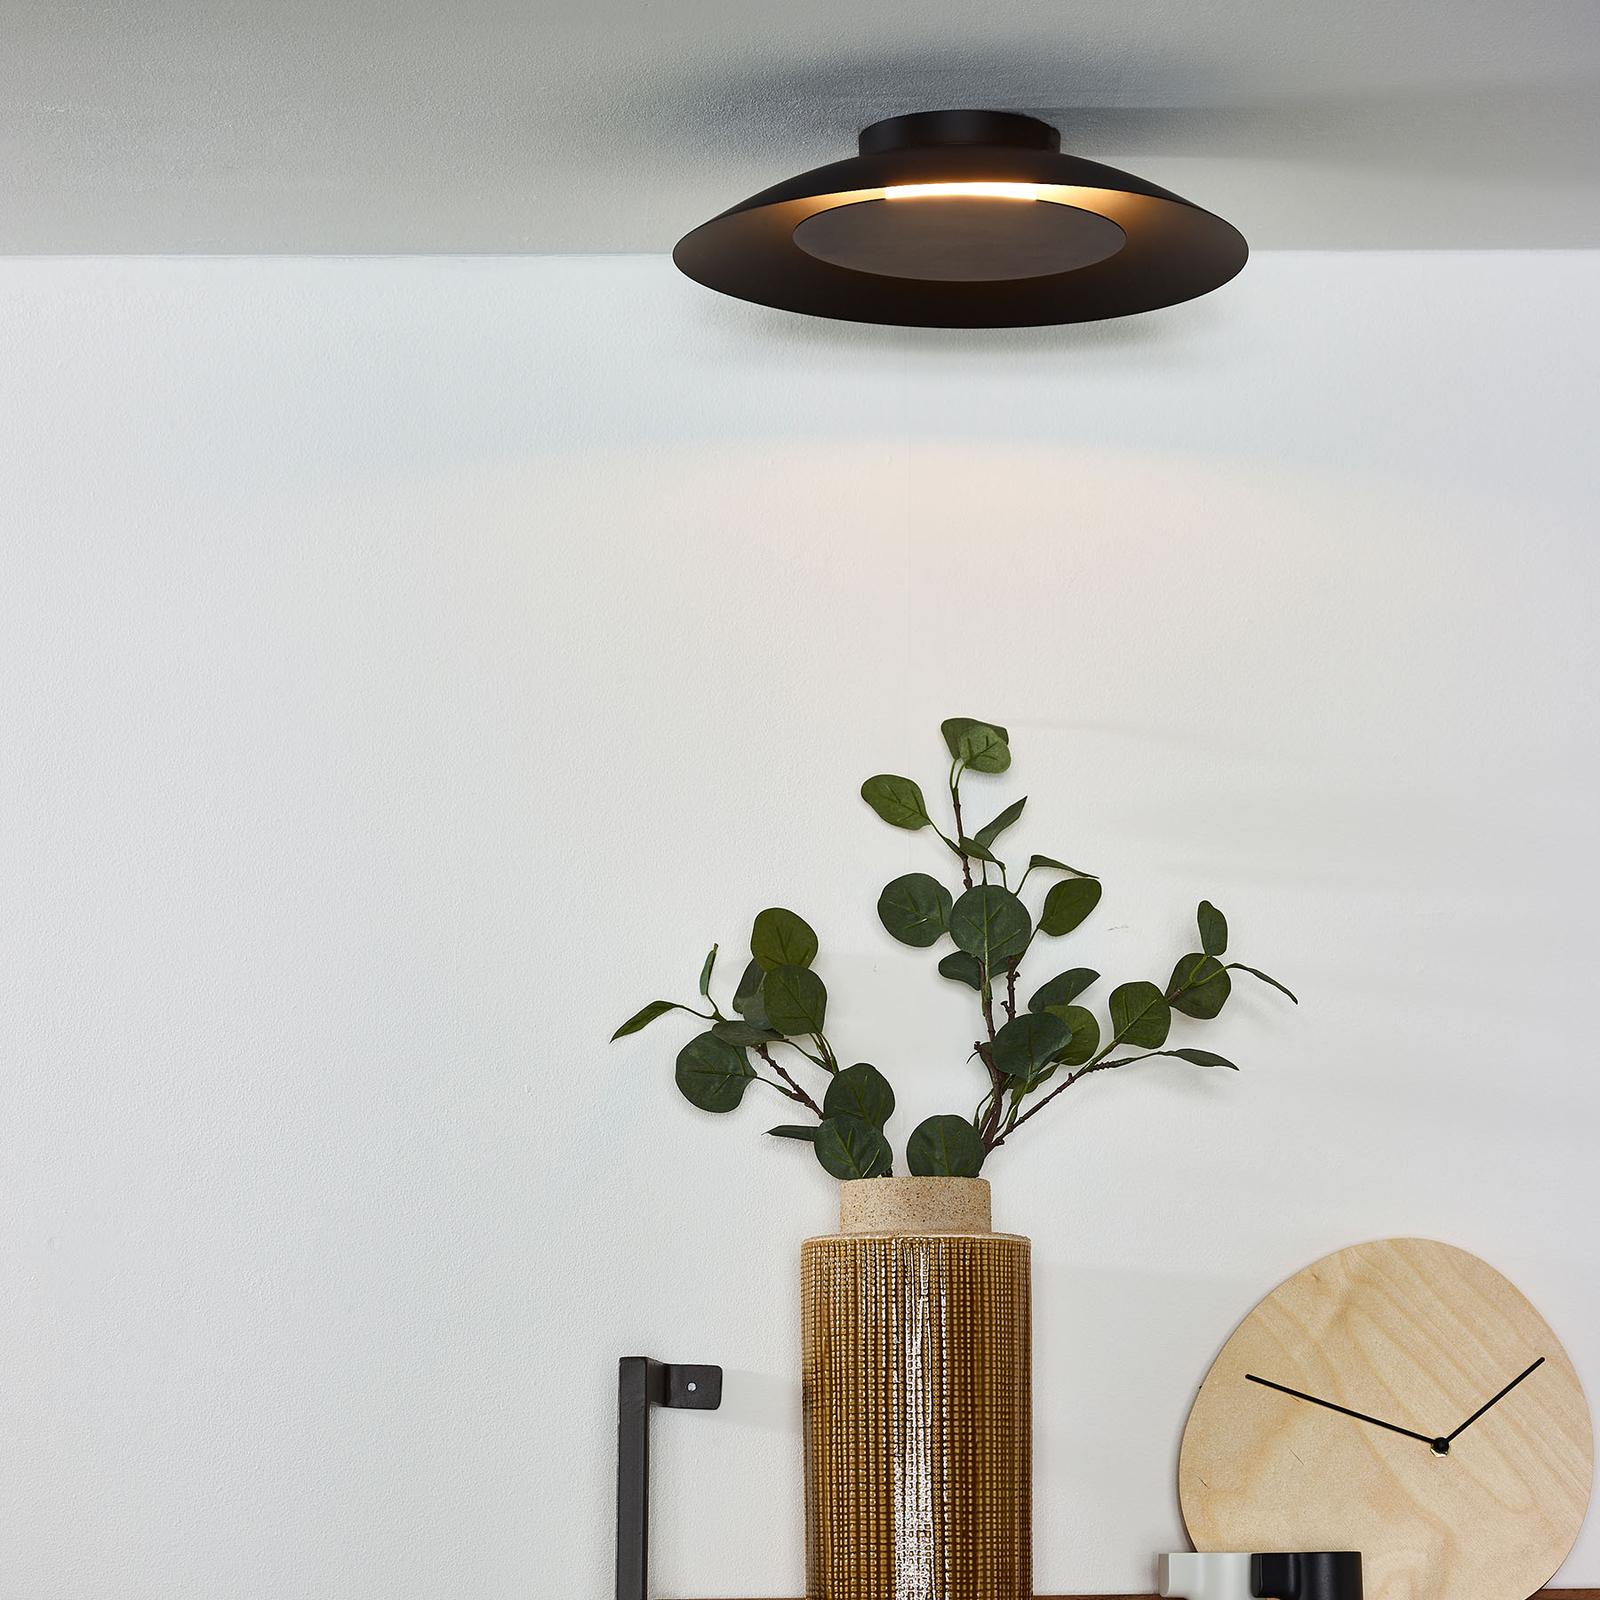 LED-kattovalaisin Foskal, musta, Ø 34,5 cm